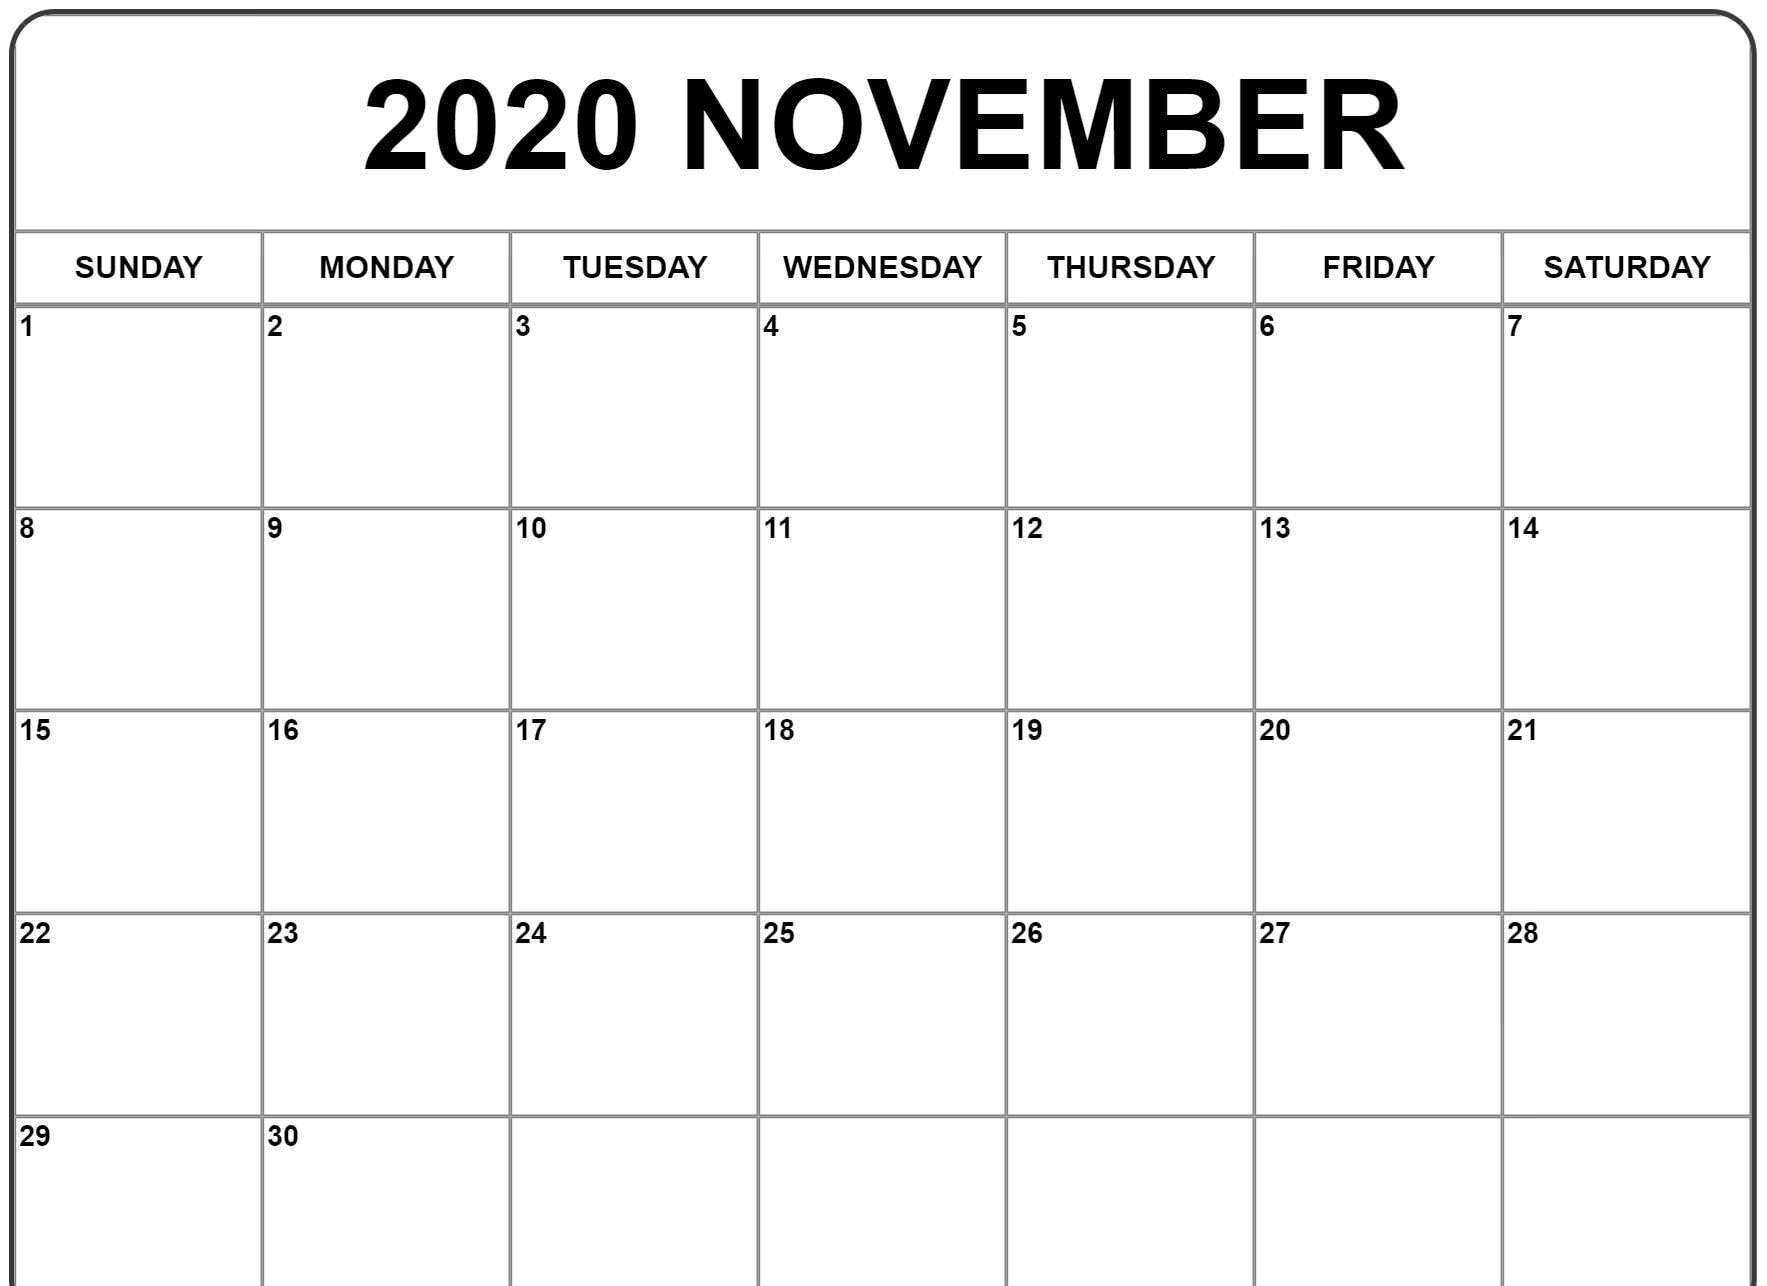 November 2020 Calendar Wallpapers - Top Free November 2020